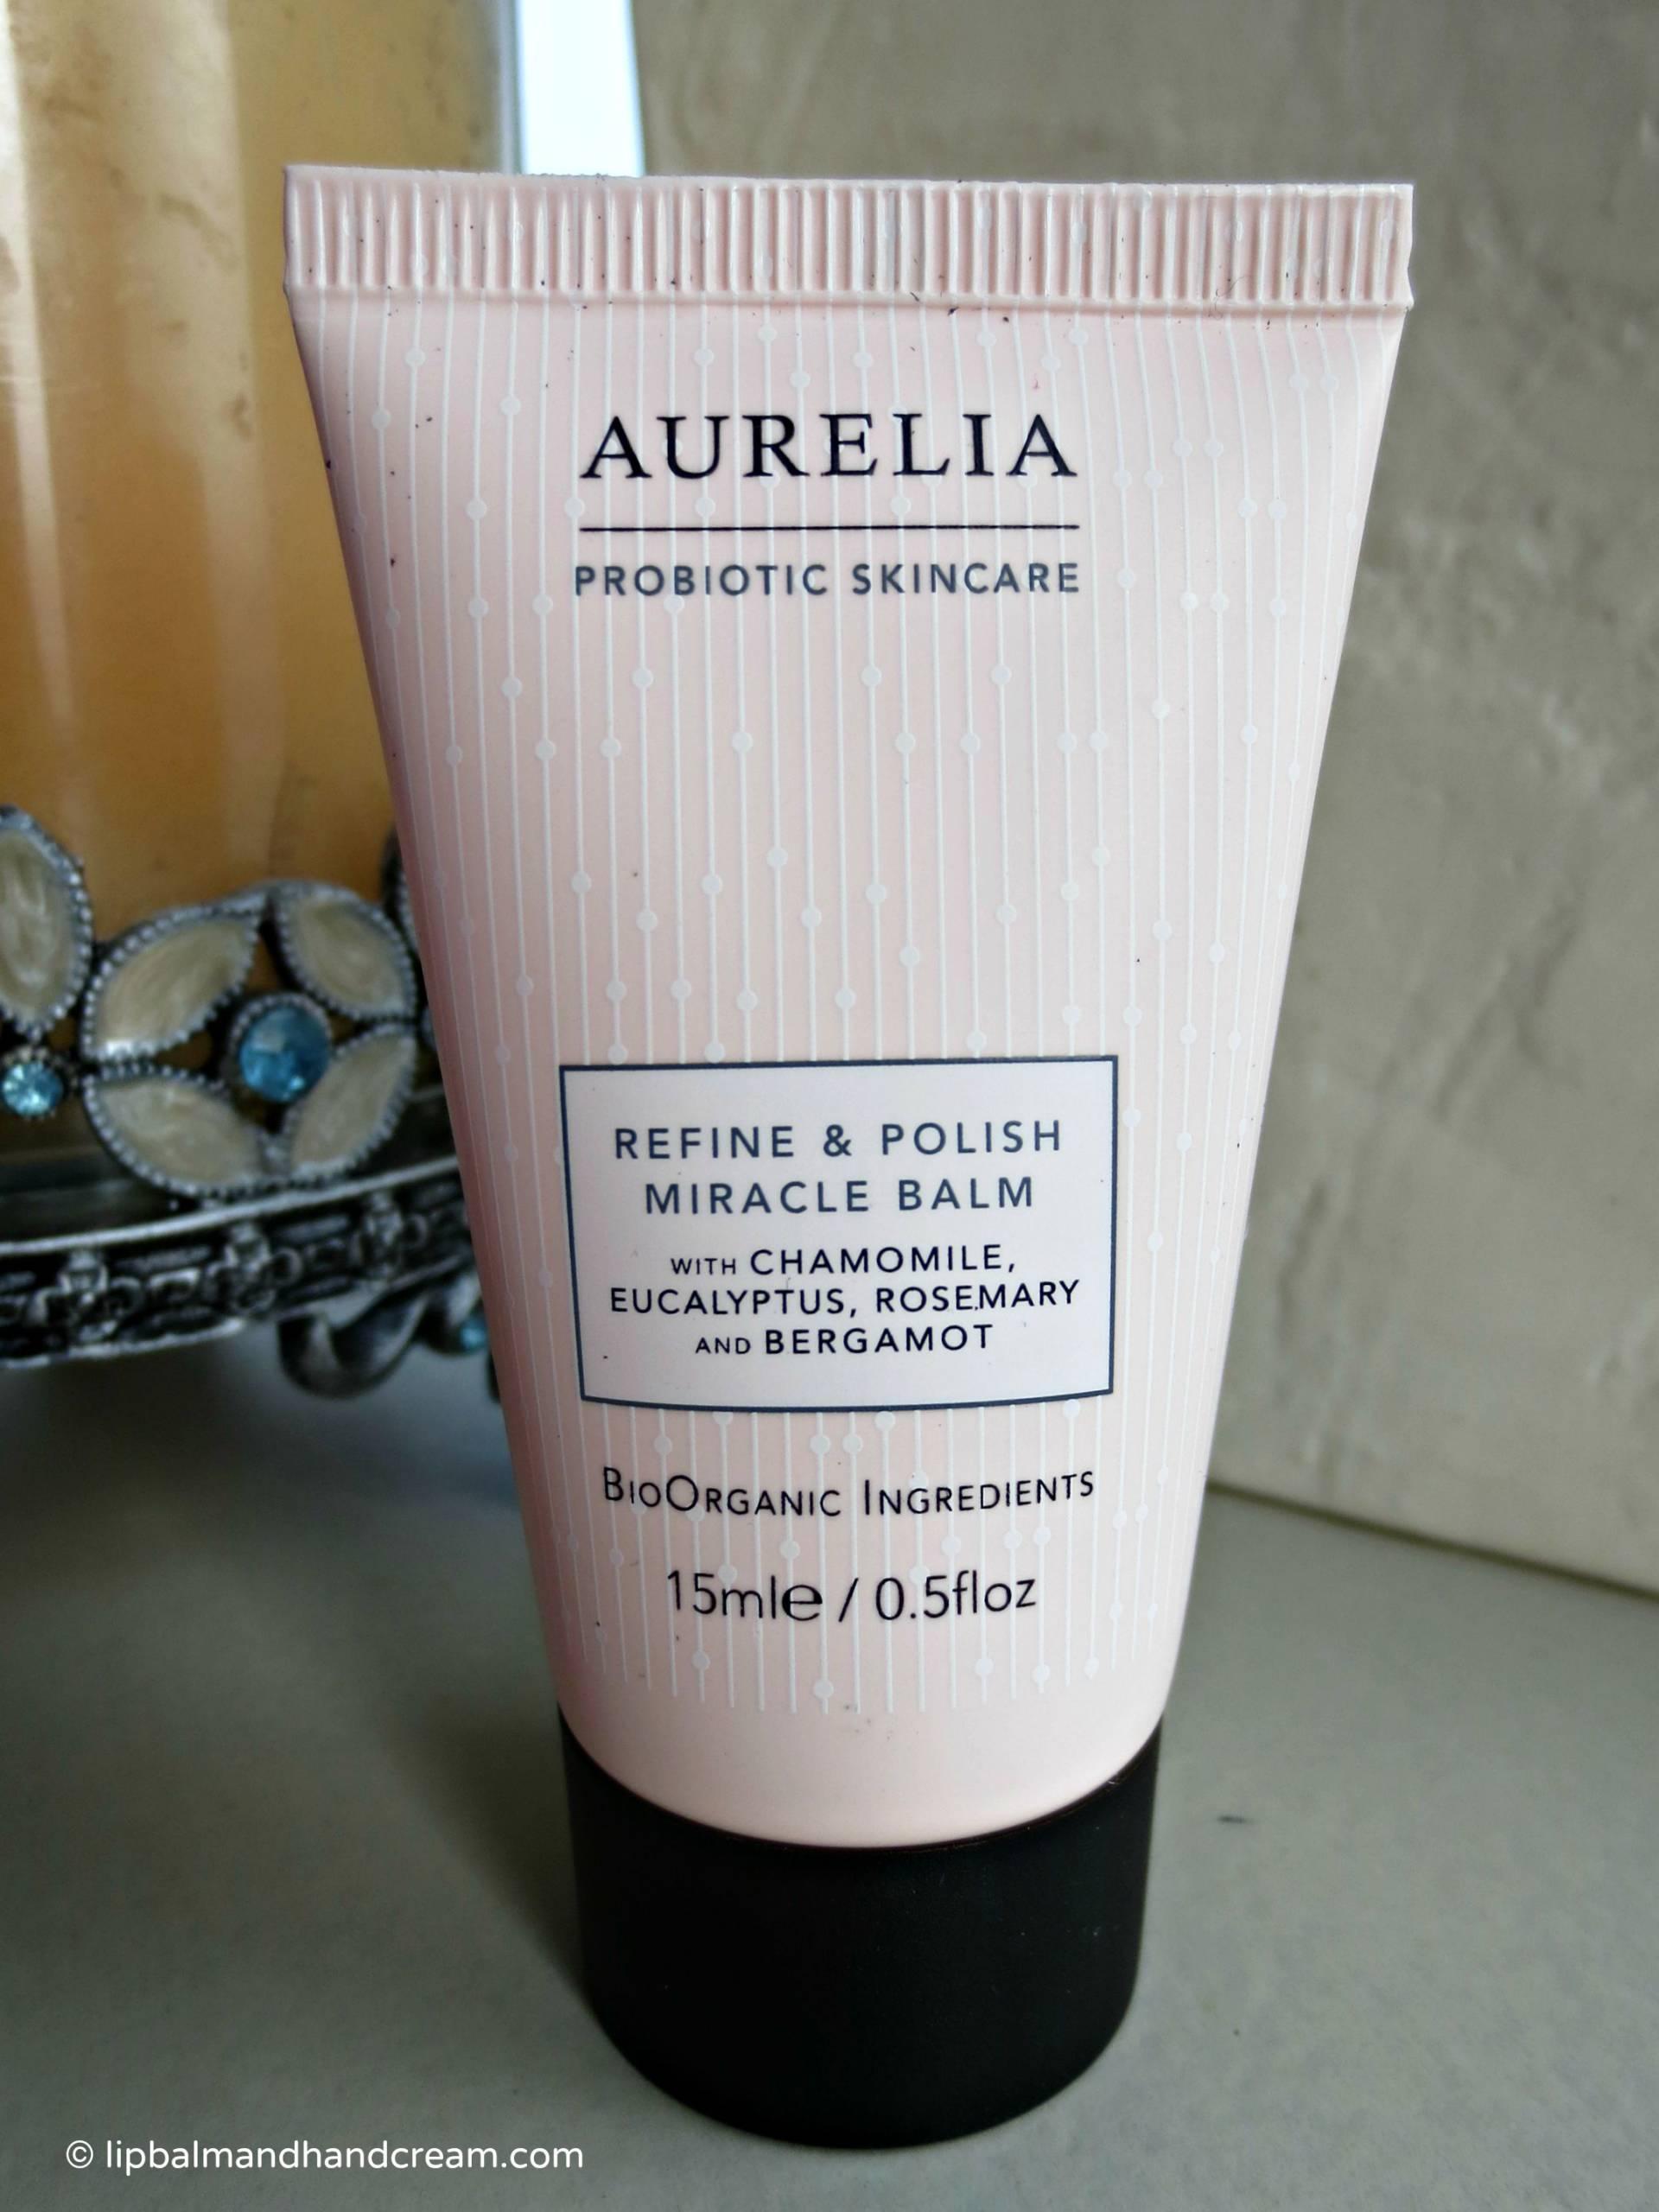 Aurelia Probiotic Skincare - refine & polish miracle balm